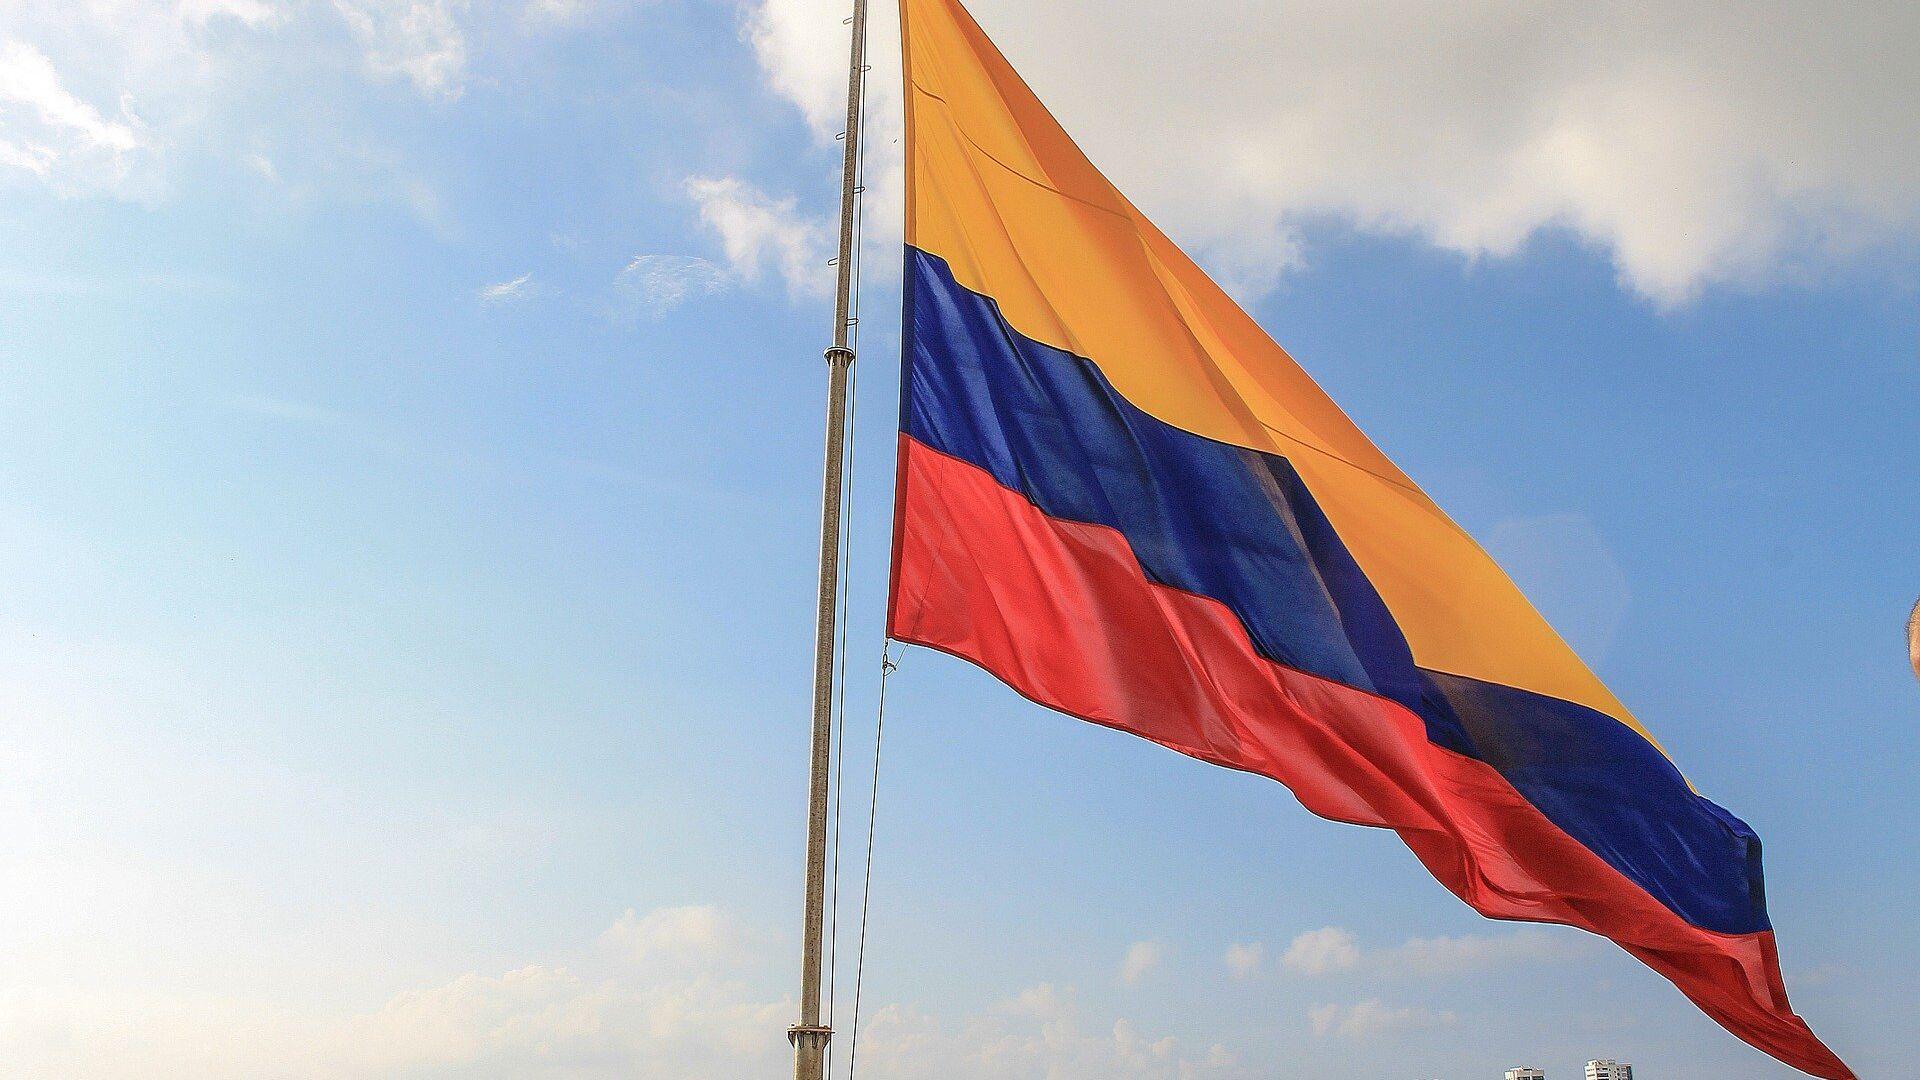 Bandera de Colombia - Sputnik Mundo, 1920, 29.09.2021